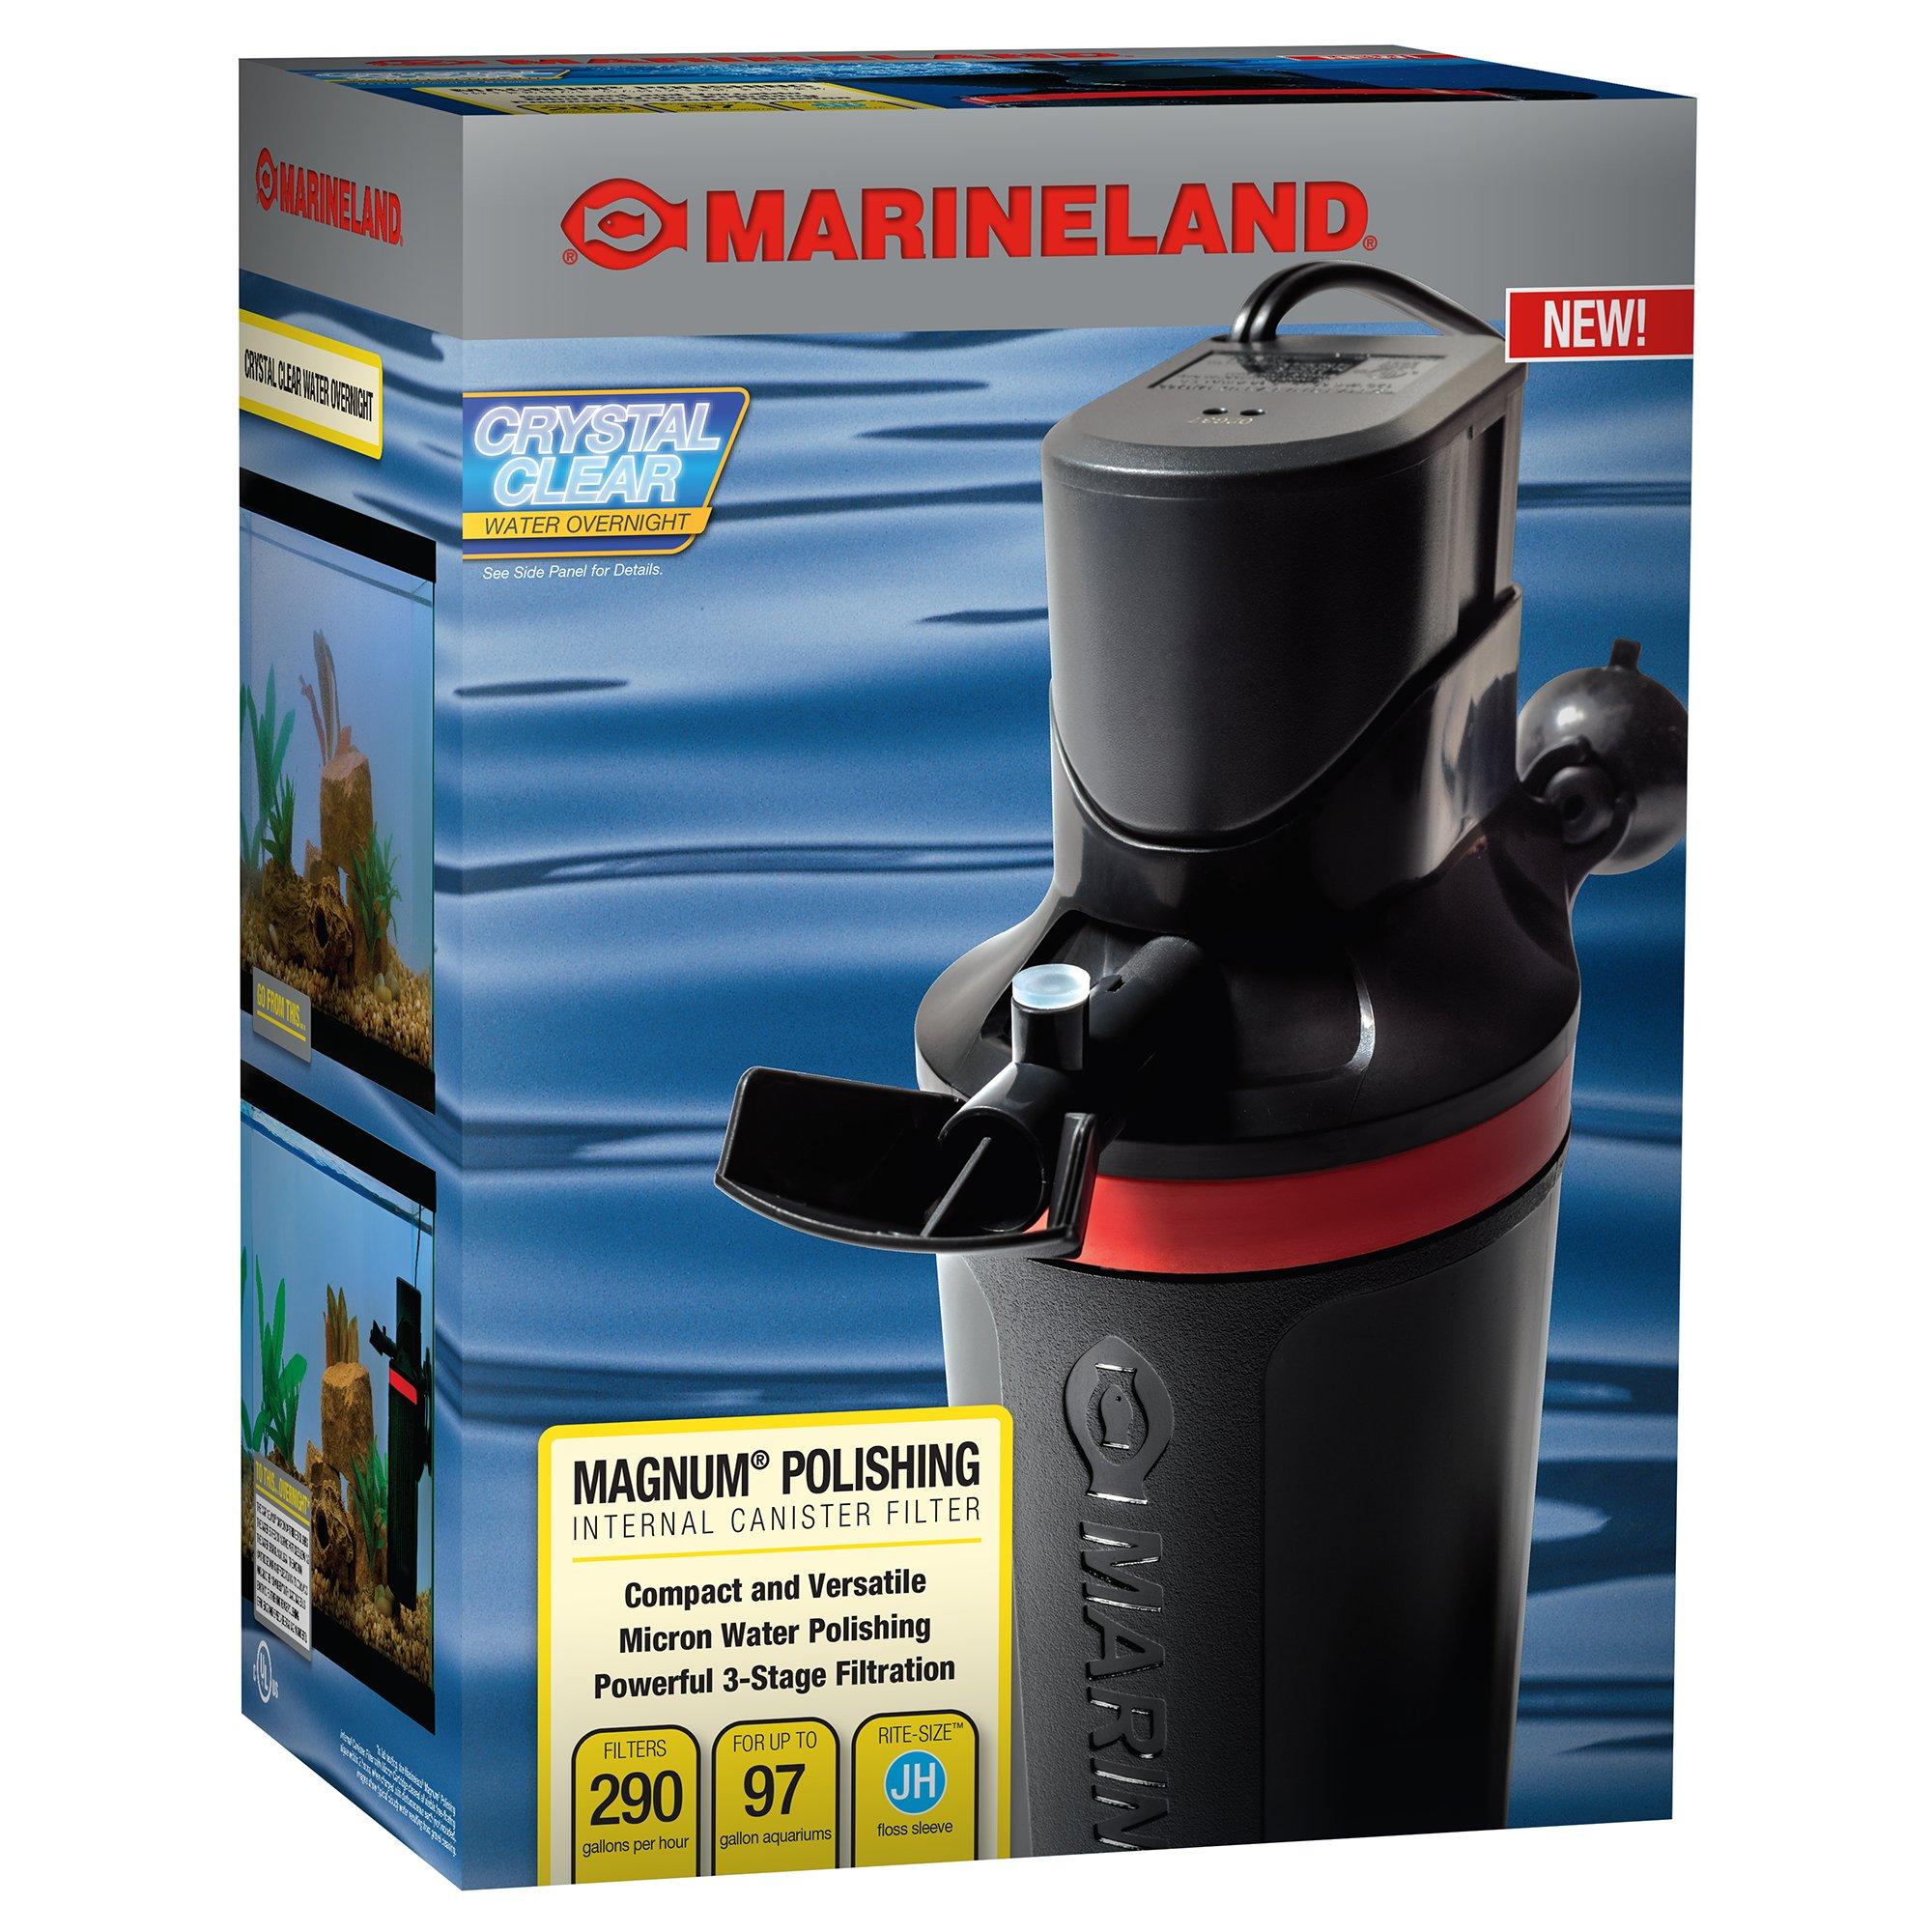 Marineland Magnum Polishing Internal Canister Filter